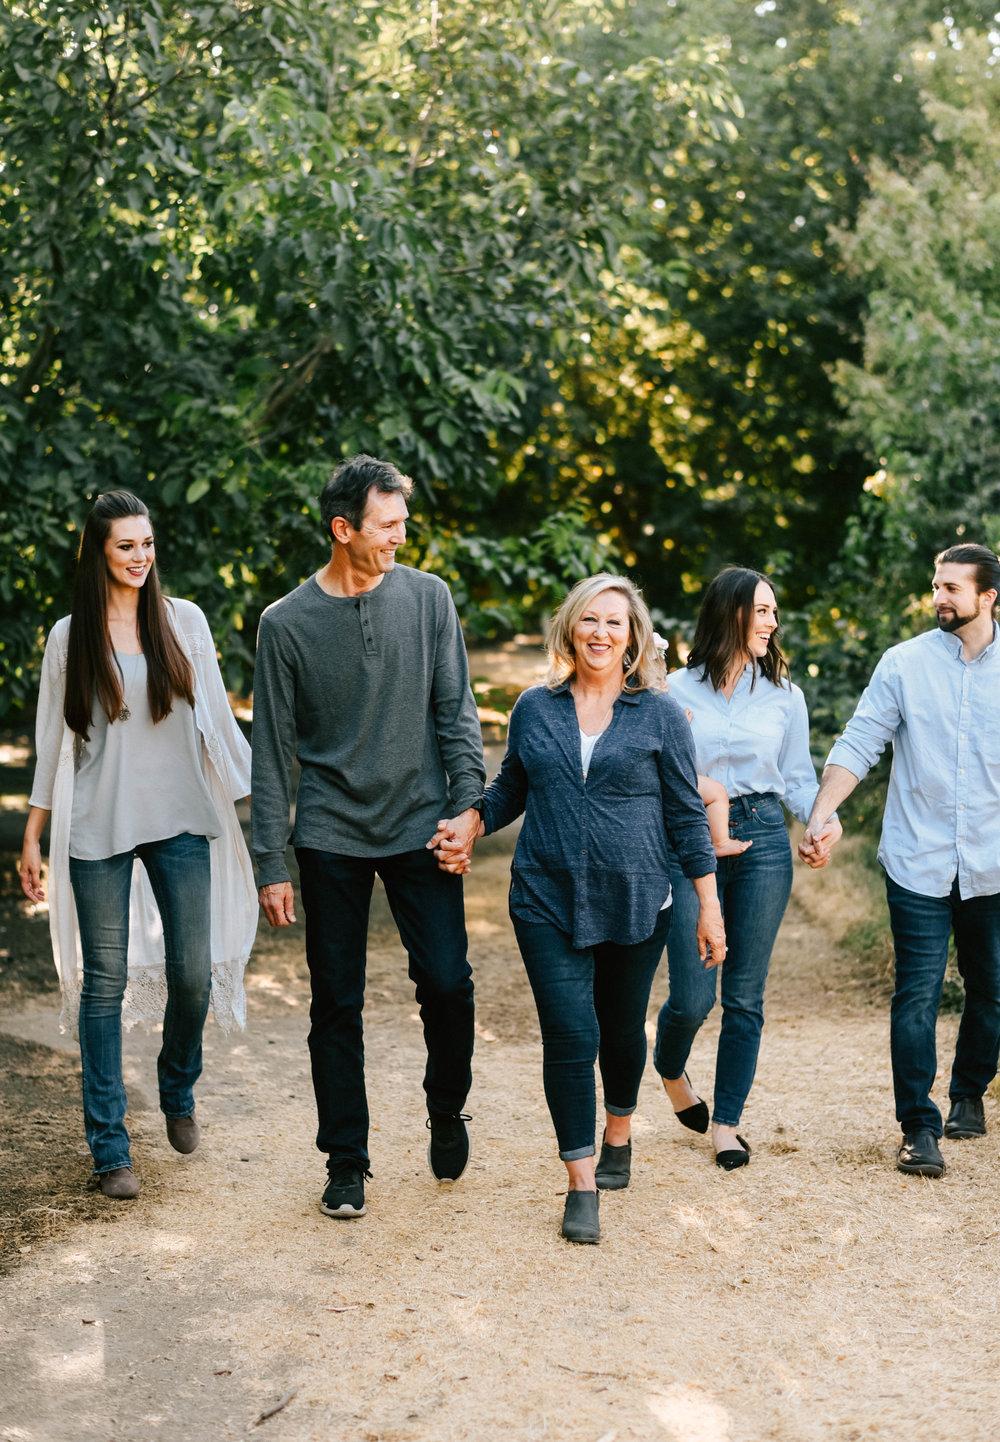 alyssajoyner+family-10.jpg